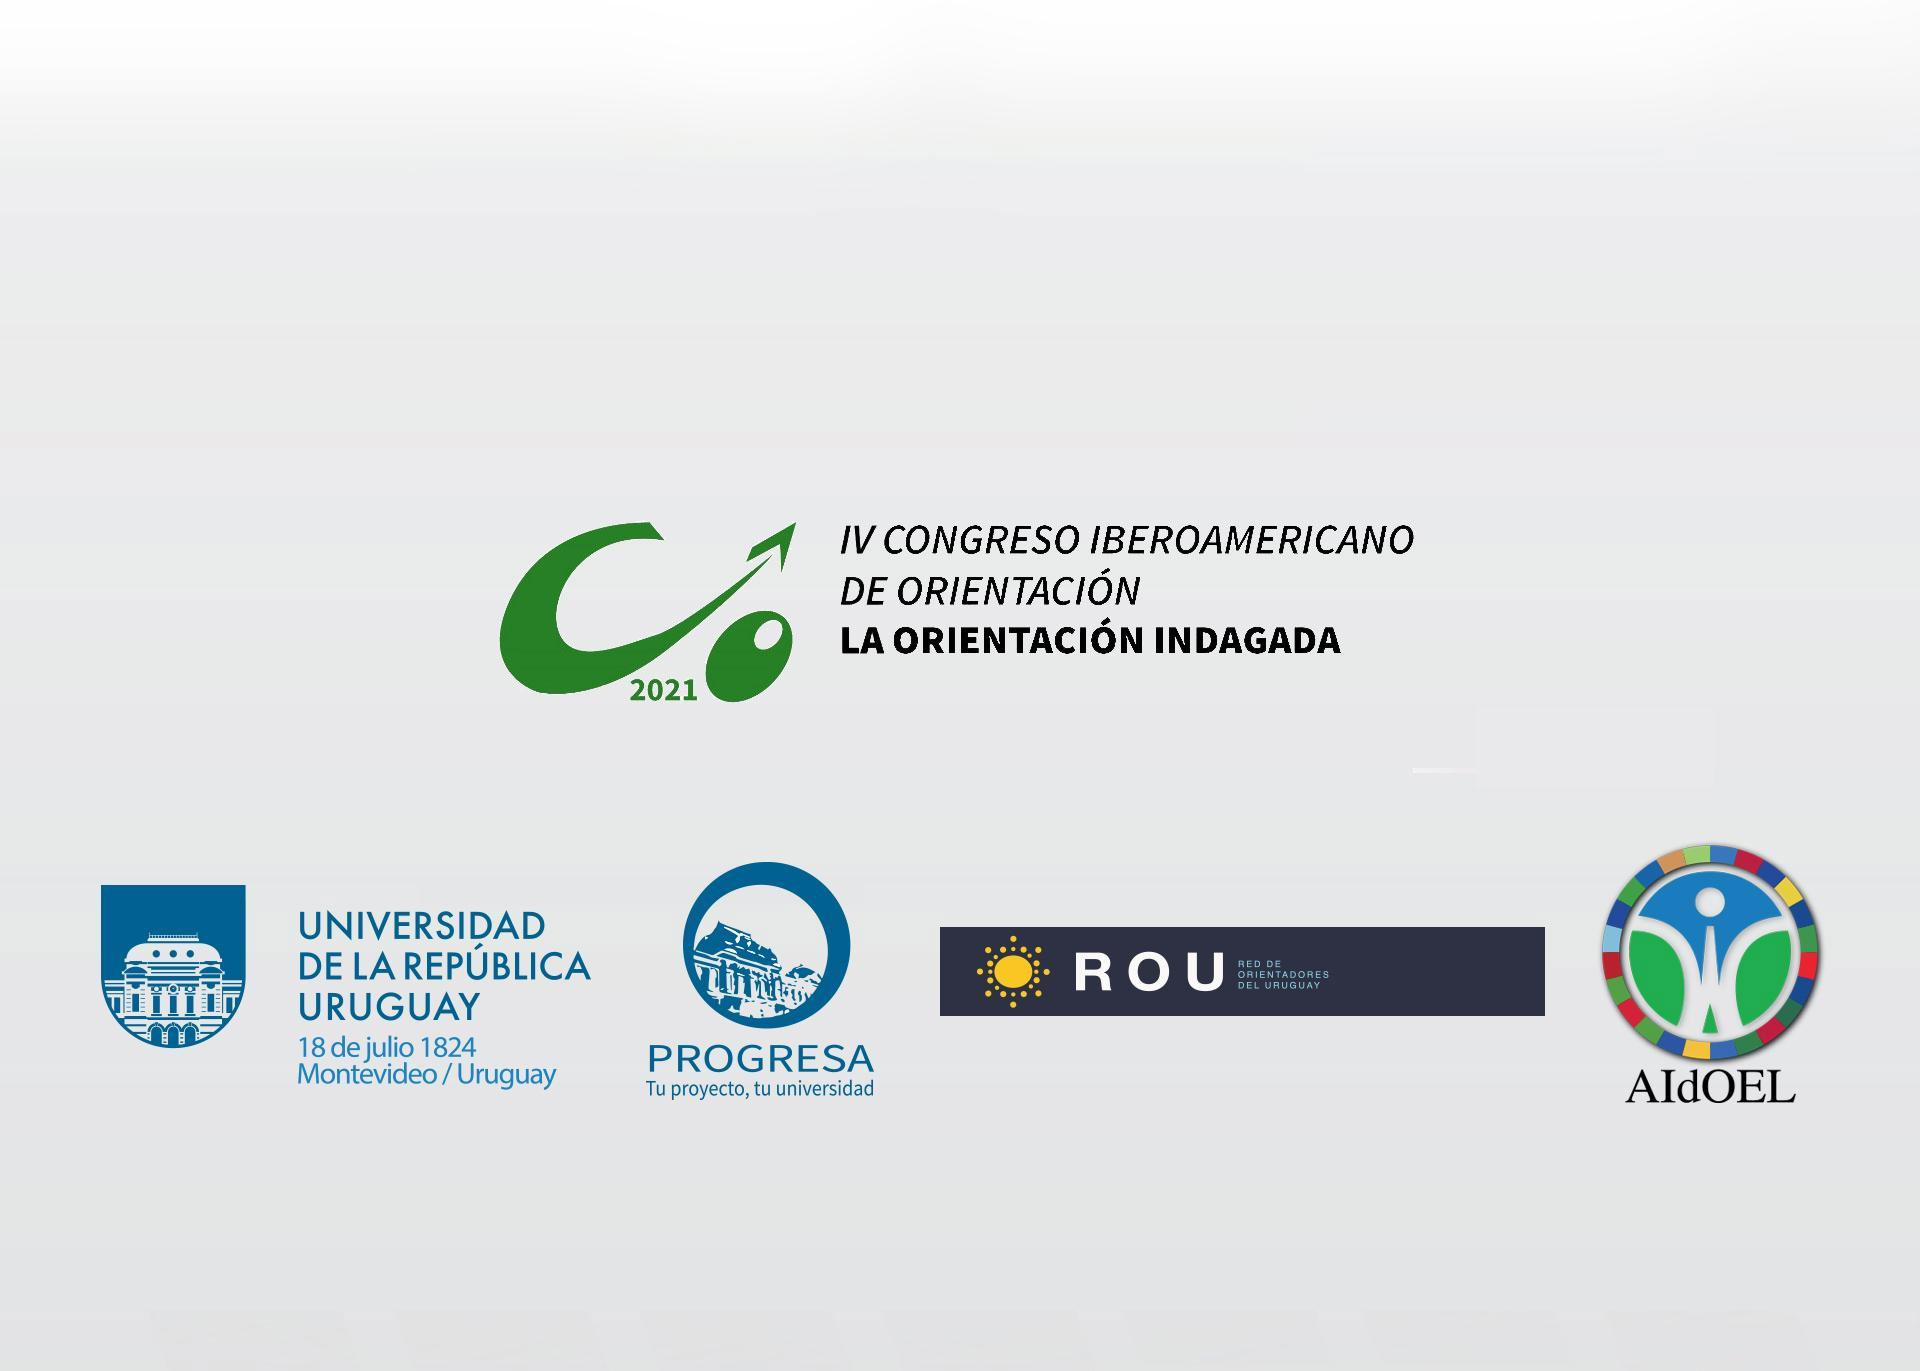 IV Congreso Iberoamericano de Orientación